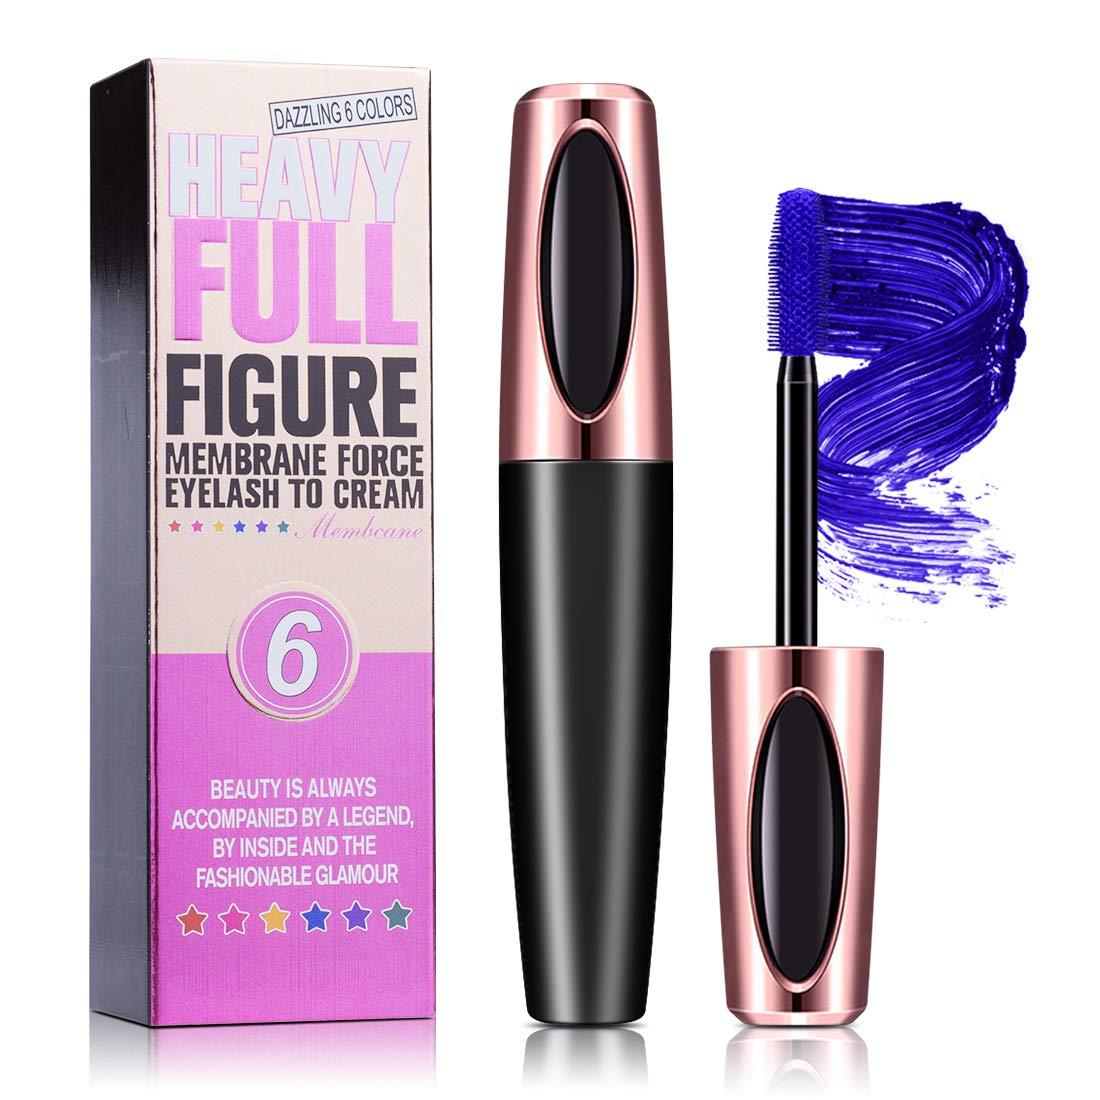 4D Silk Fiber Lash Mascara Colorful, Long Lasting, Thickening and Lengthening, Blue Eyelash Mascara, All Day Exquisitely, Natural & Non-Toxic (Blue)